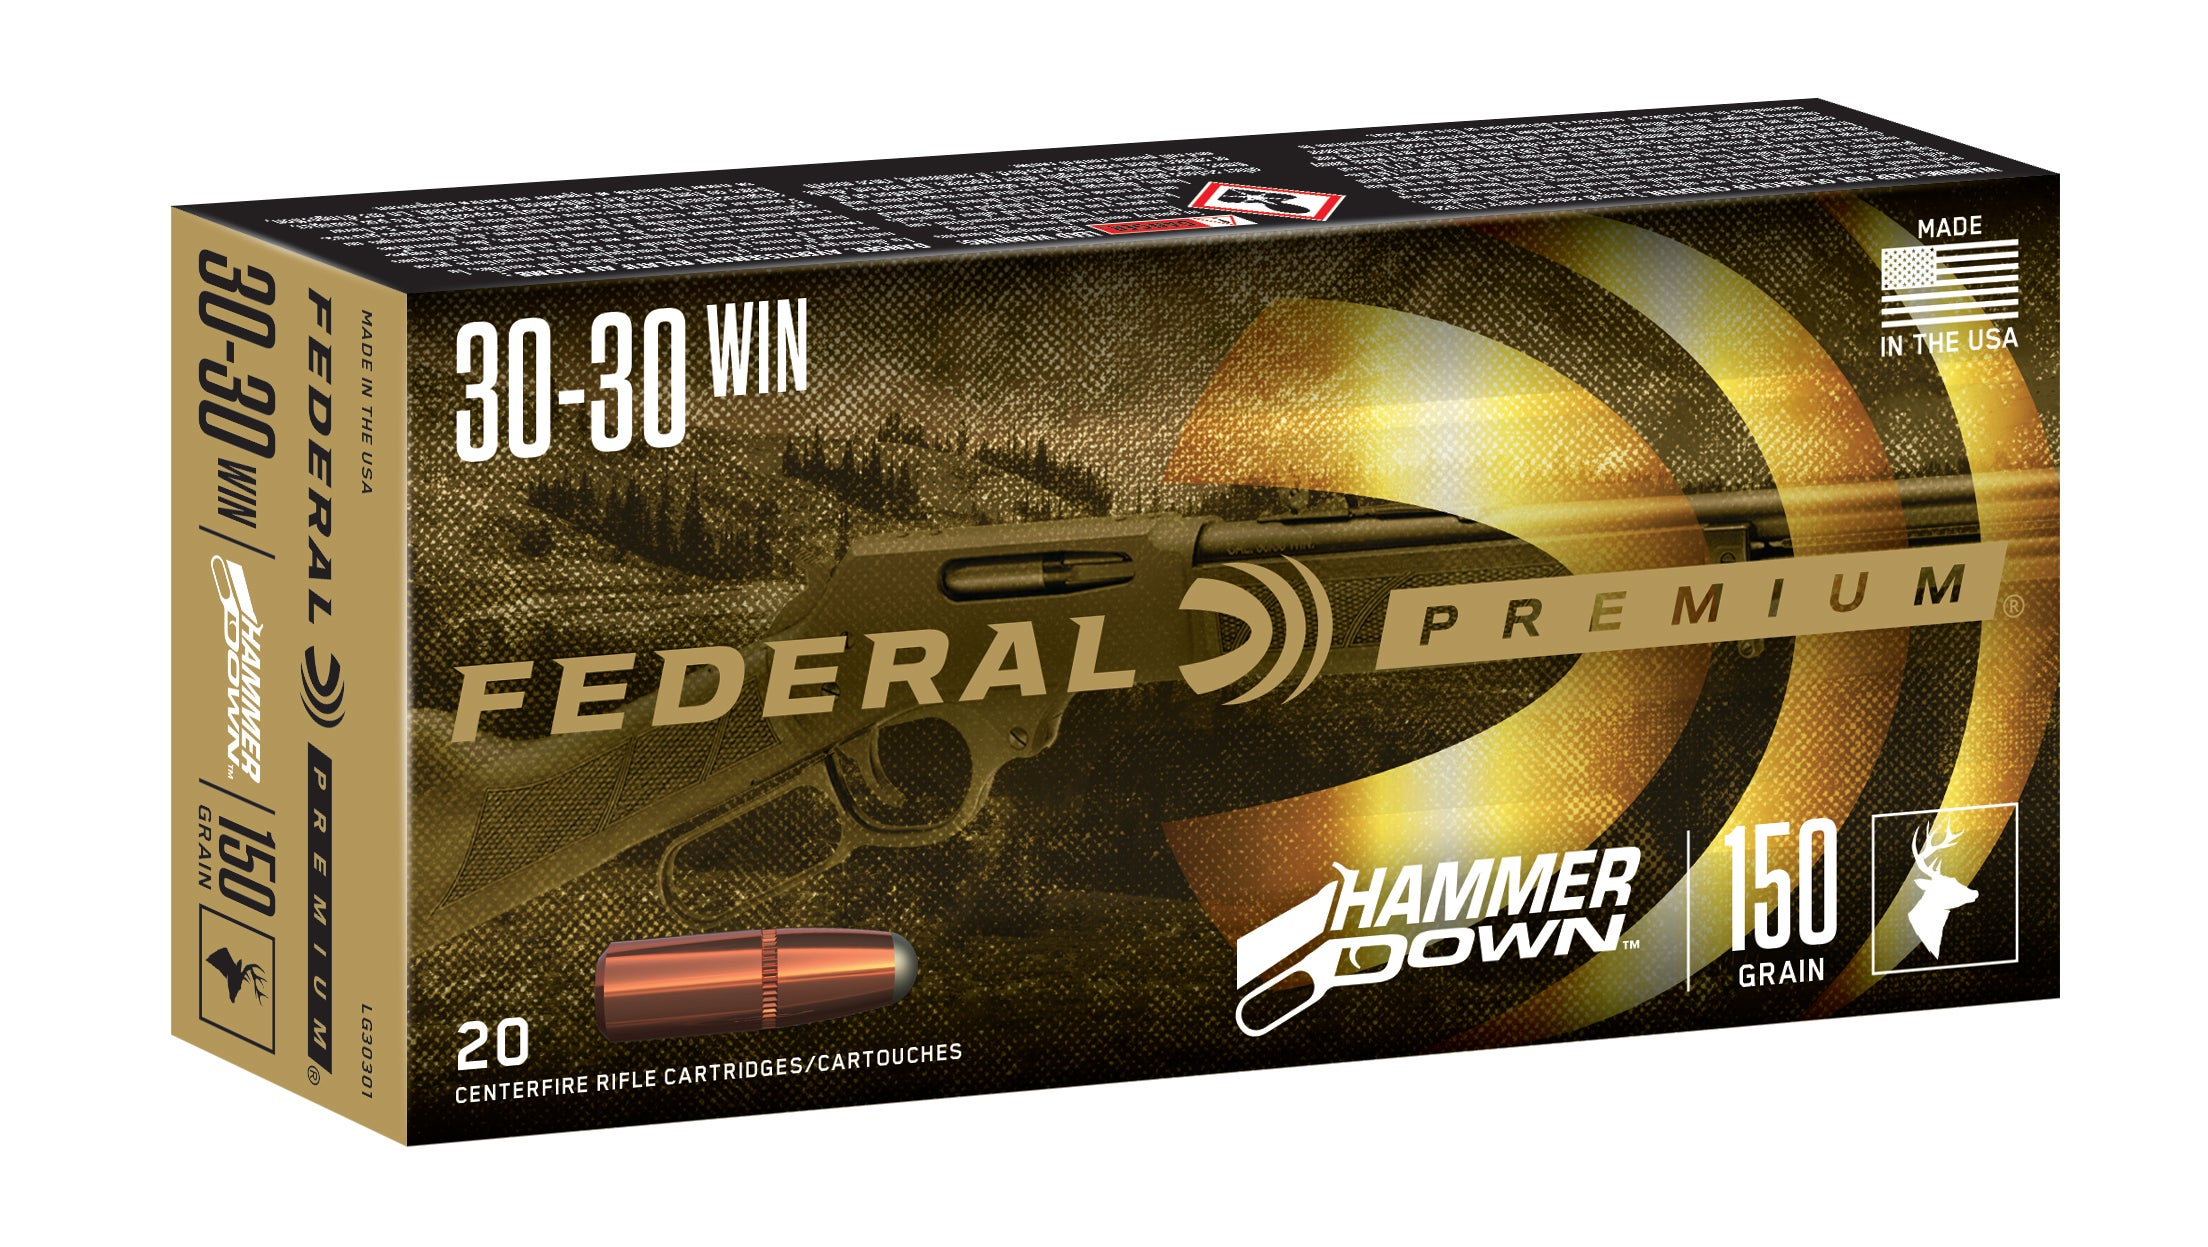 First Look: Federal Premium Hammer Down Ammunition